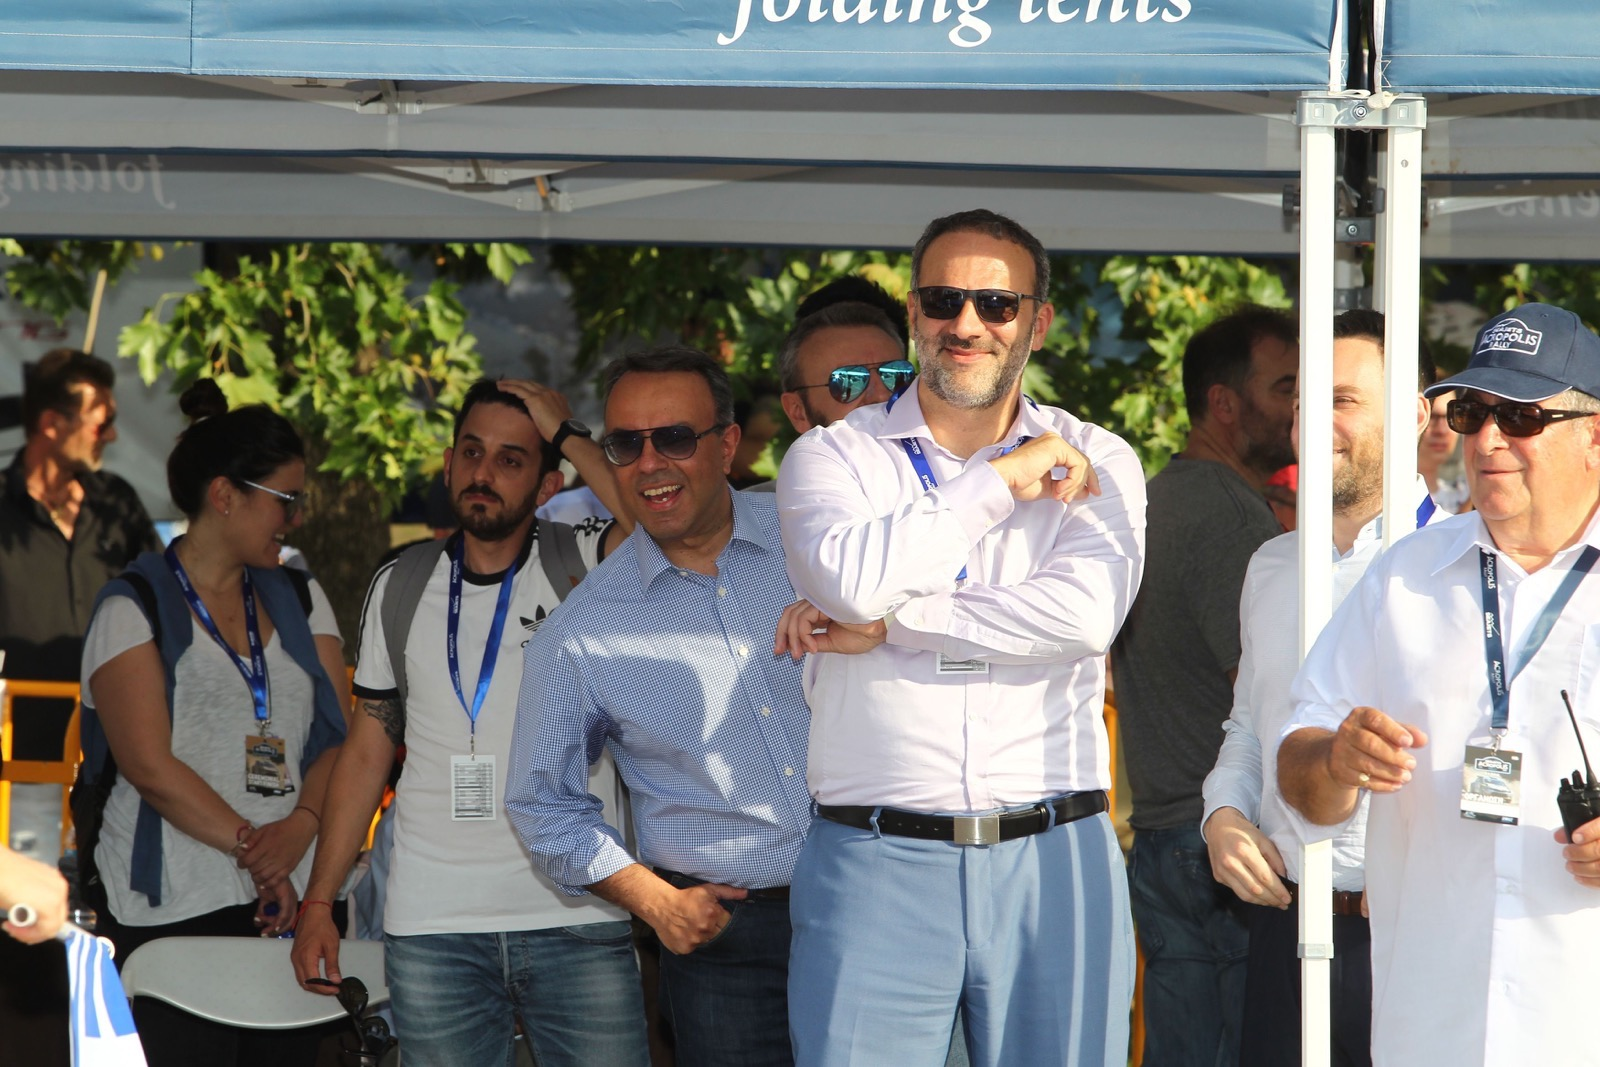 Rally_Acropolis_2017_Ceremonial_Start_29